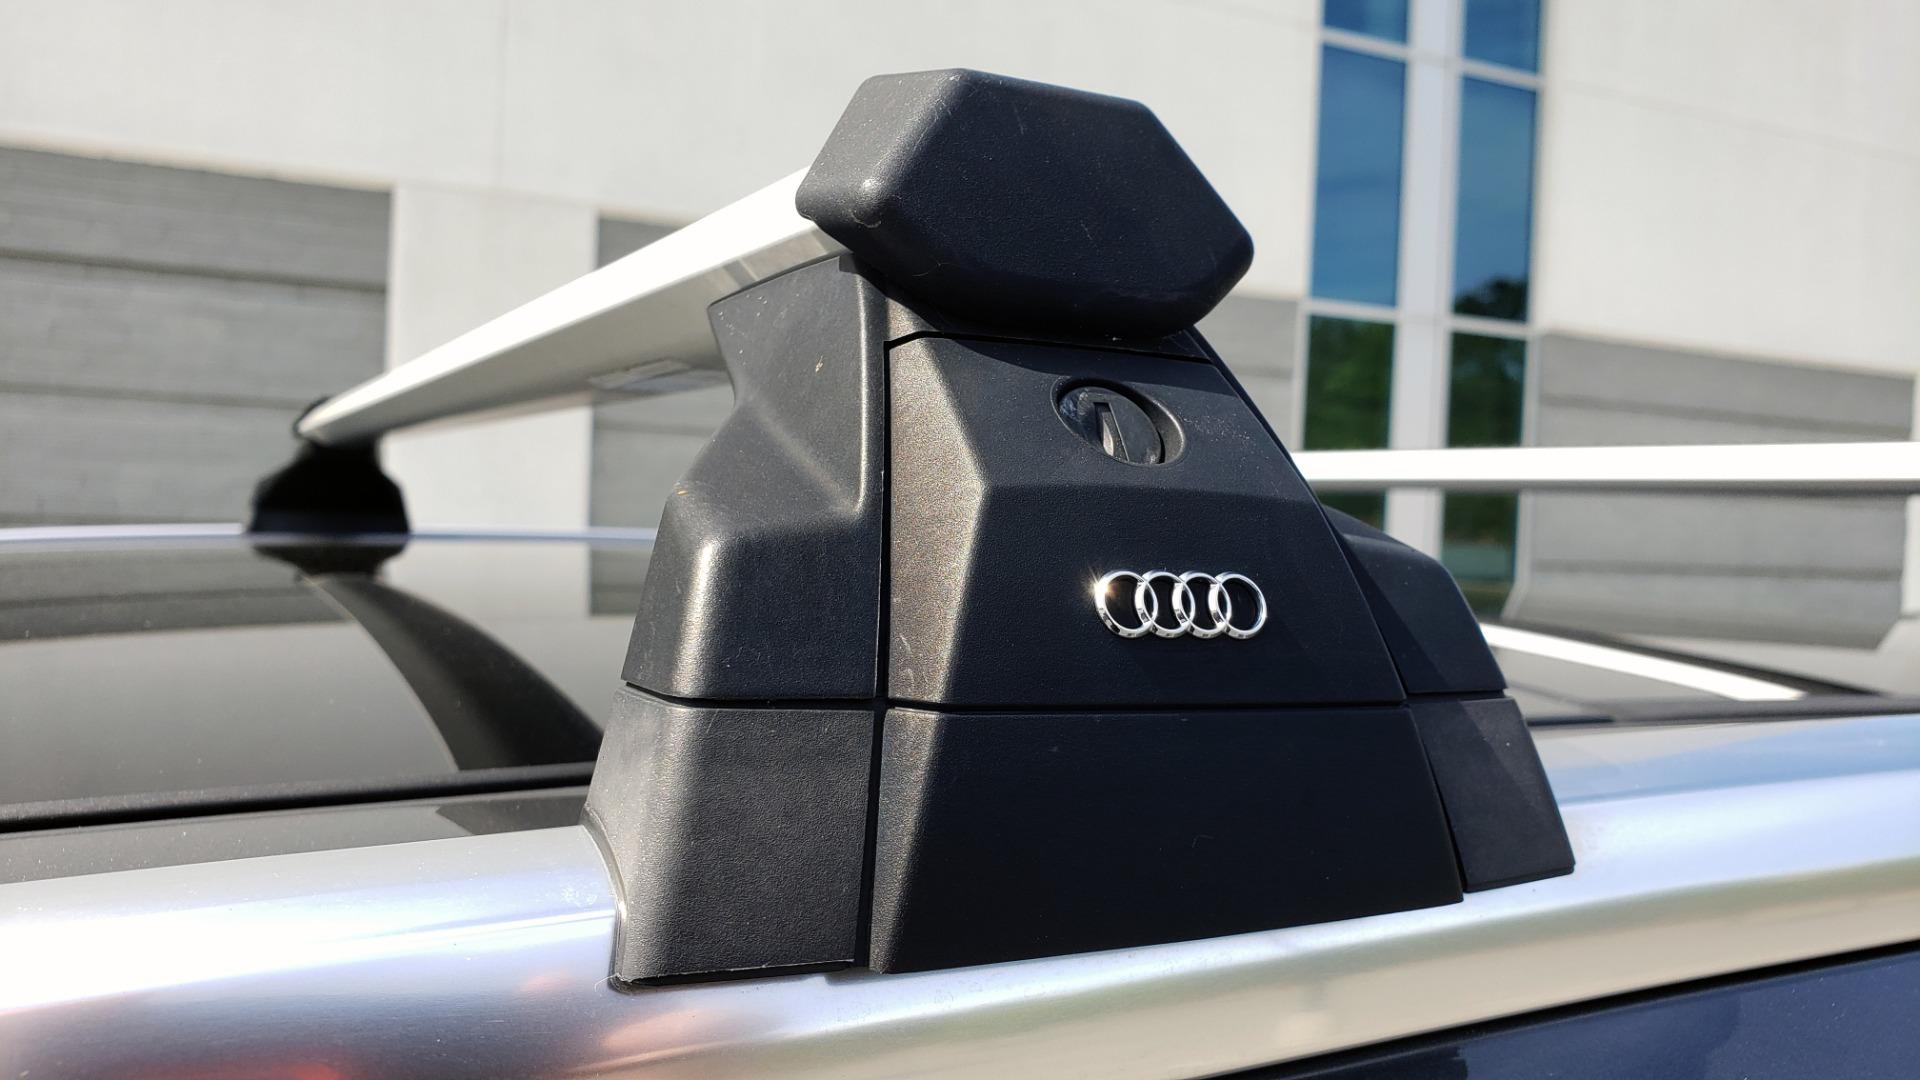 Used 2018 Audi Q7 PRESTIGE TIPTRONIC / NAV / SUNROOF / ADAPTIVE PKG / DRVR ASST / CLD WTHR /  for sale $49,995 at Formula Imports in Charlotte NC 28227 7